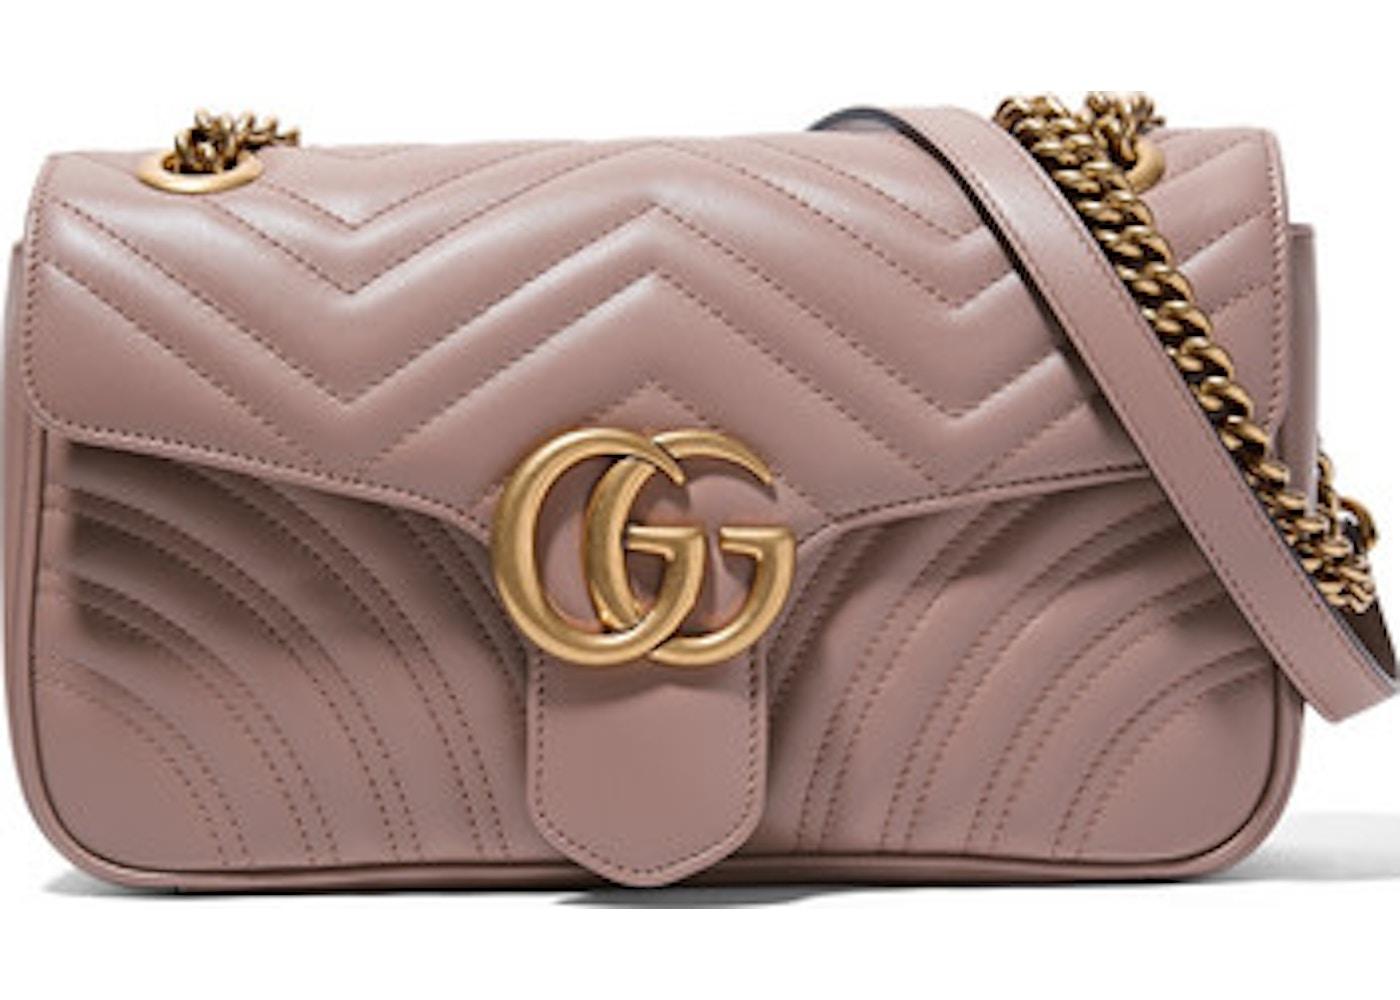 9443a4af8388 Gucci Marmont Matelasse GG Small Porcelain Rose